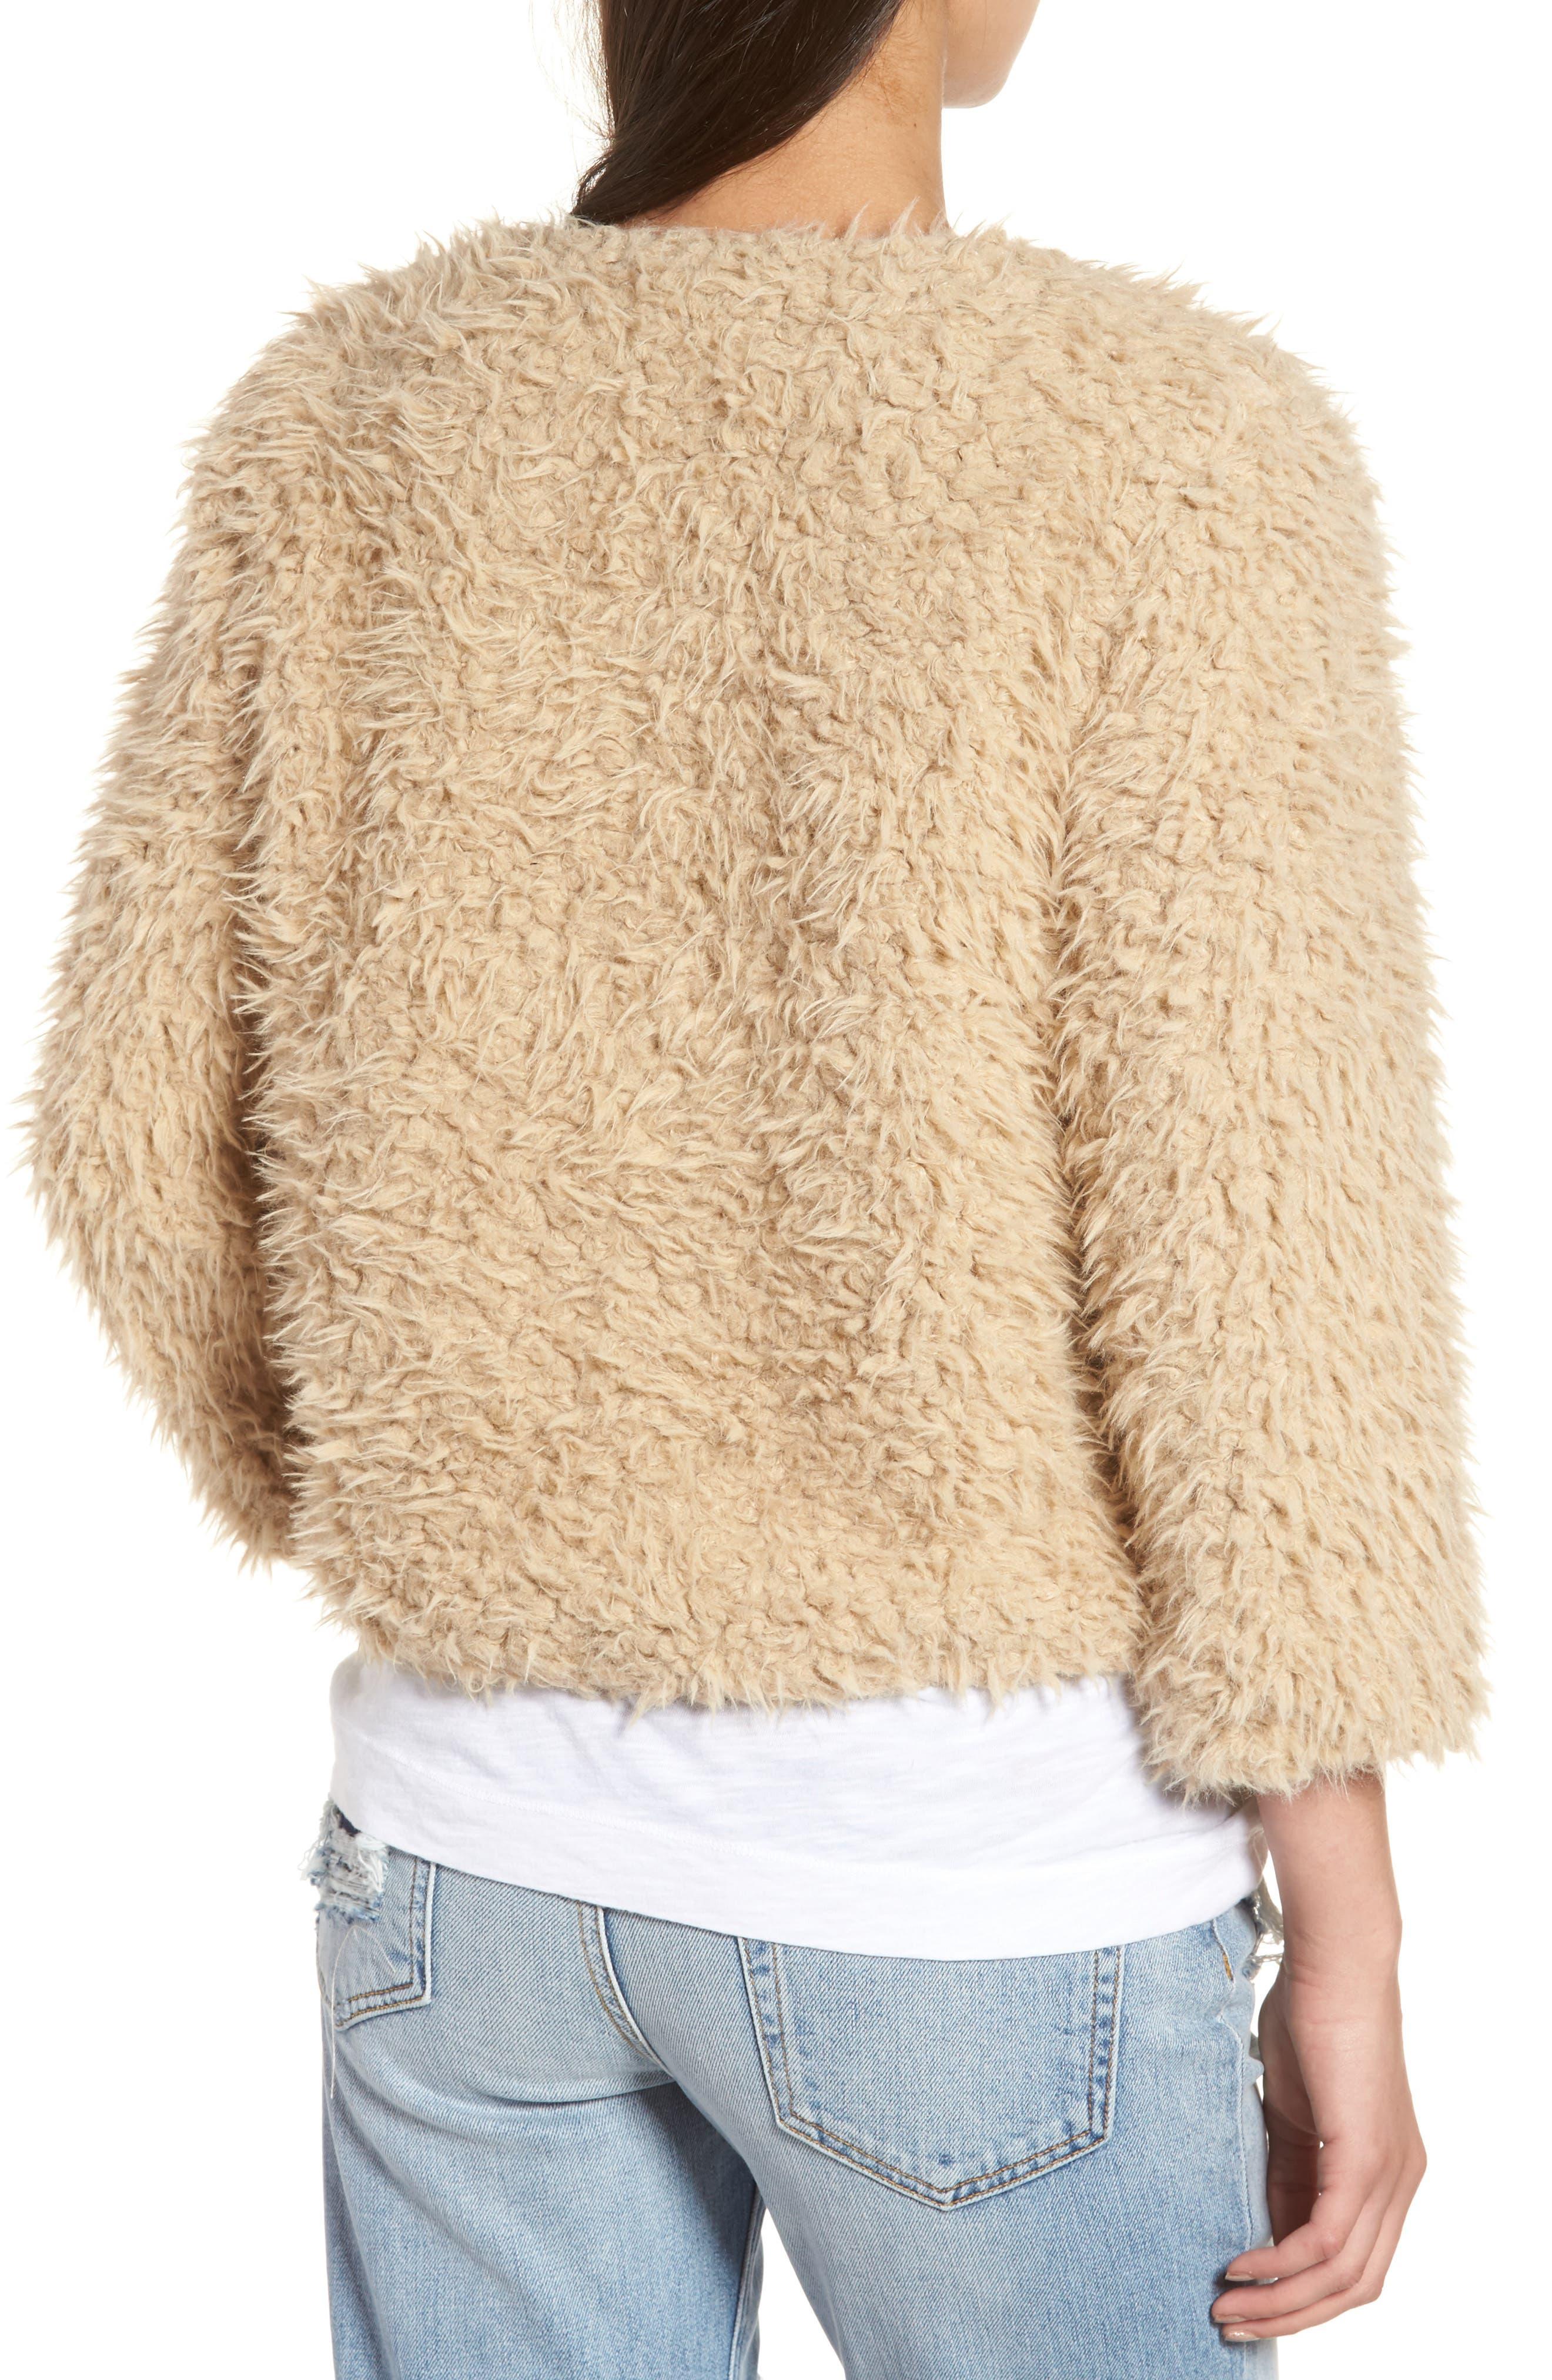 Macy Faux Fur Jacket,                             Alternate thumbnail 2, color,                             Light Camel